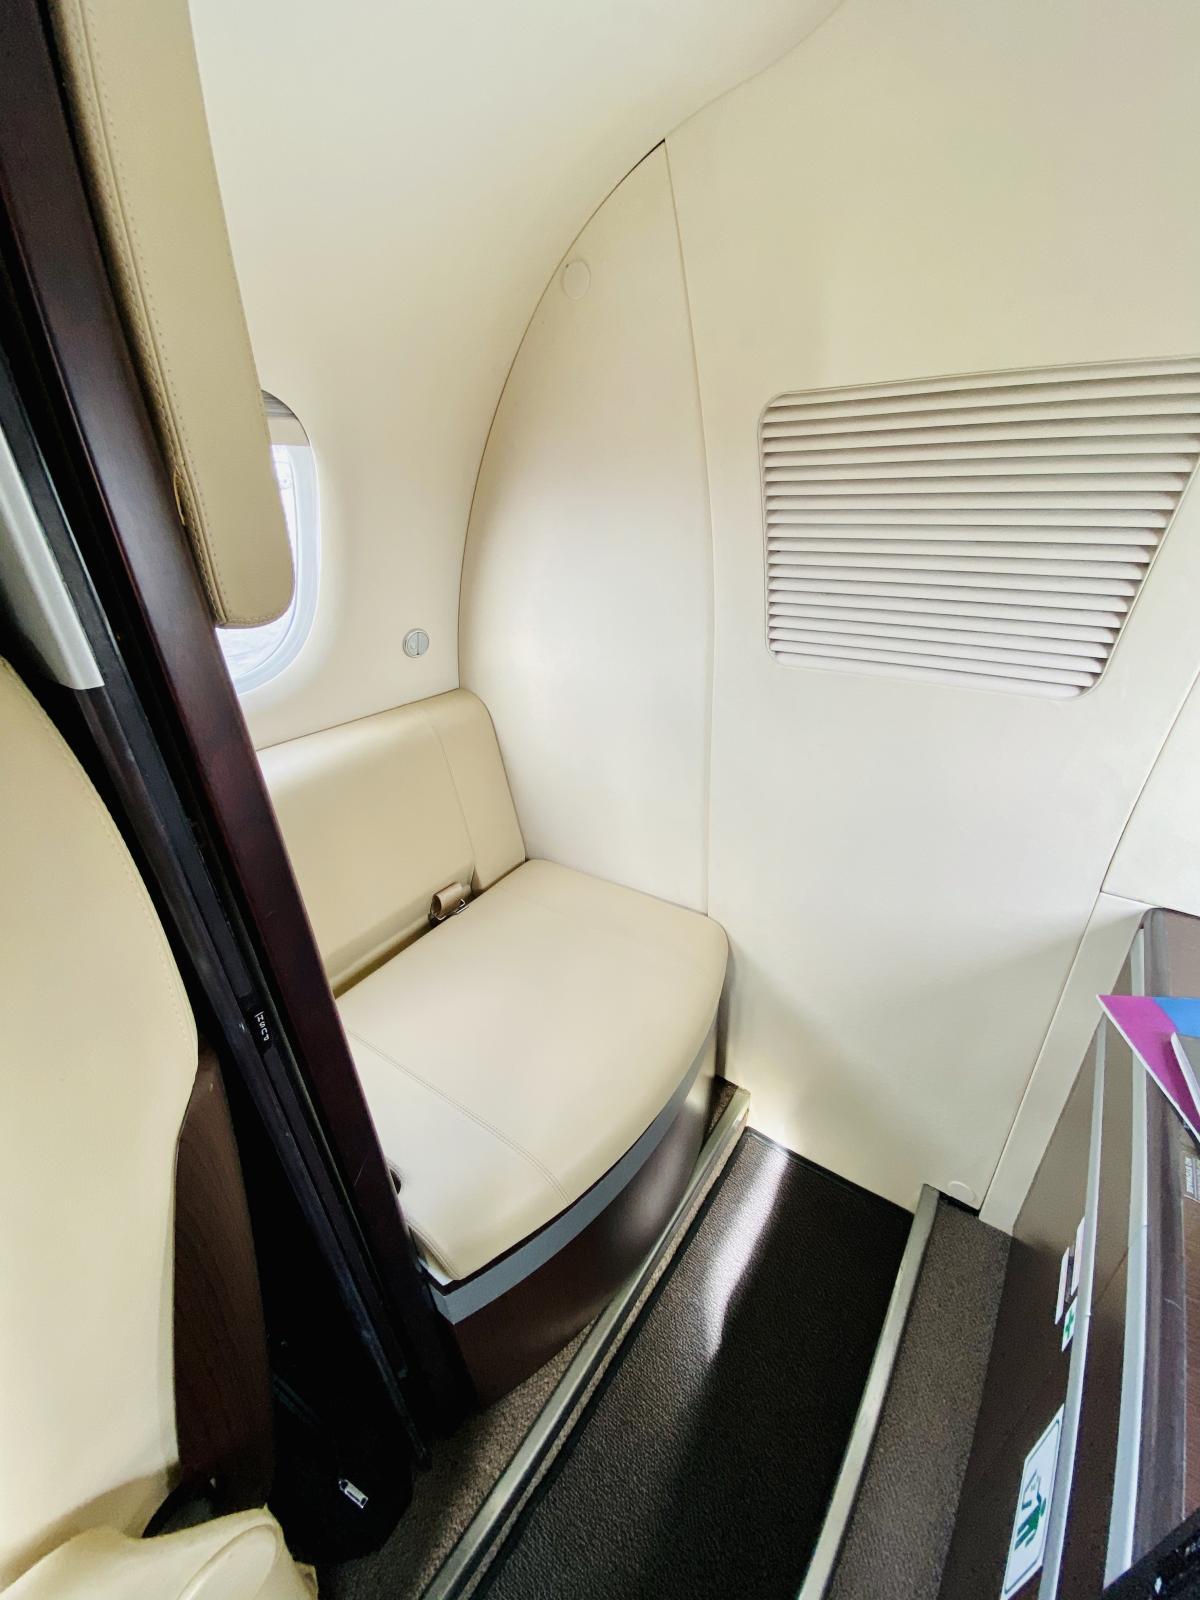 2011 Embraer Phenom 100 Photo 7